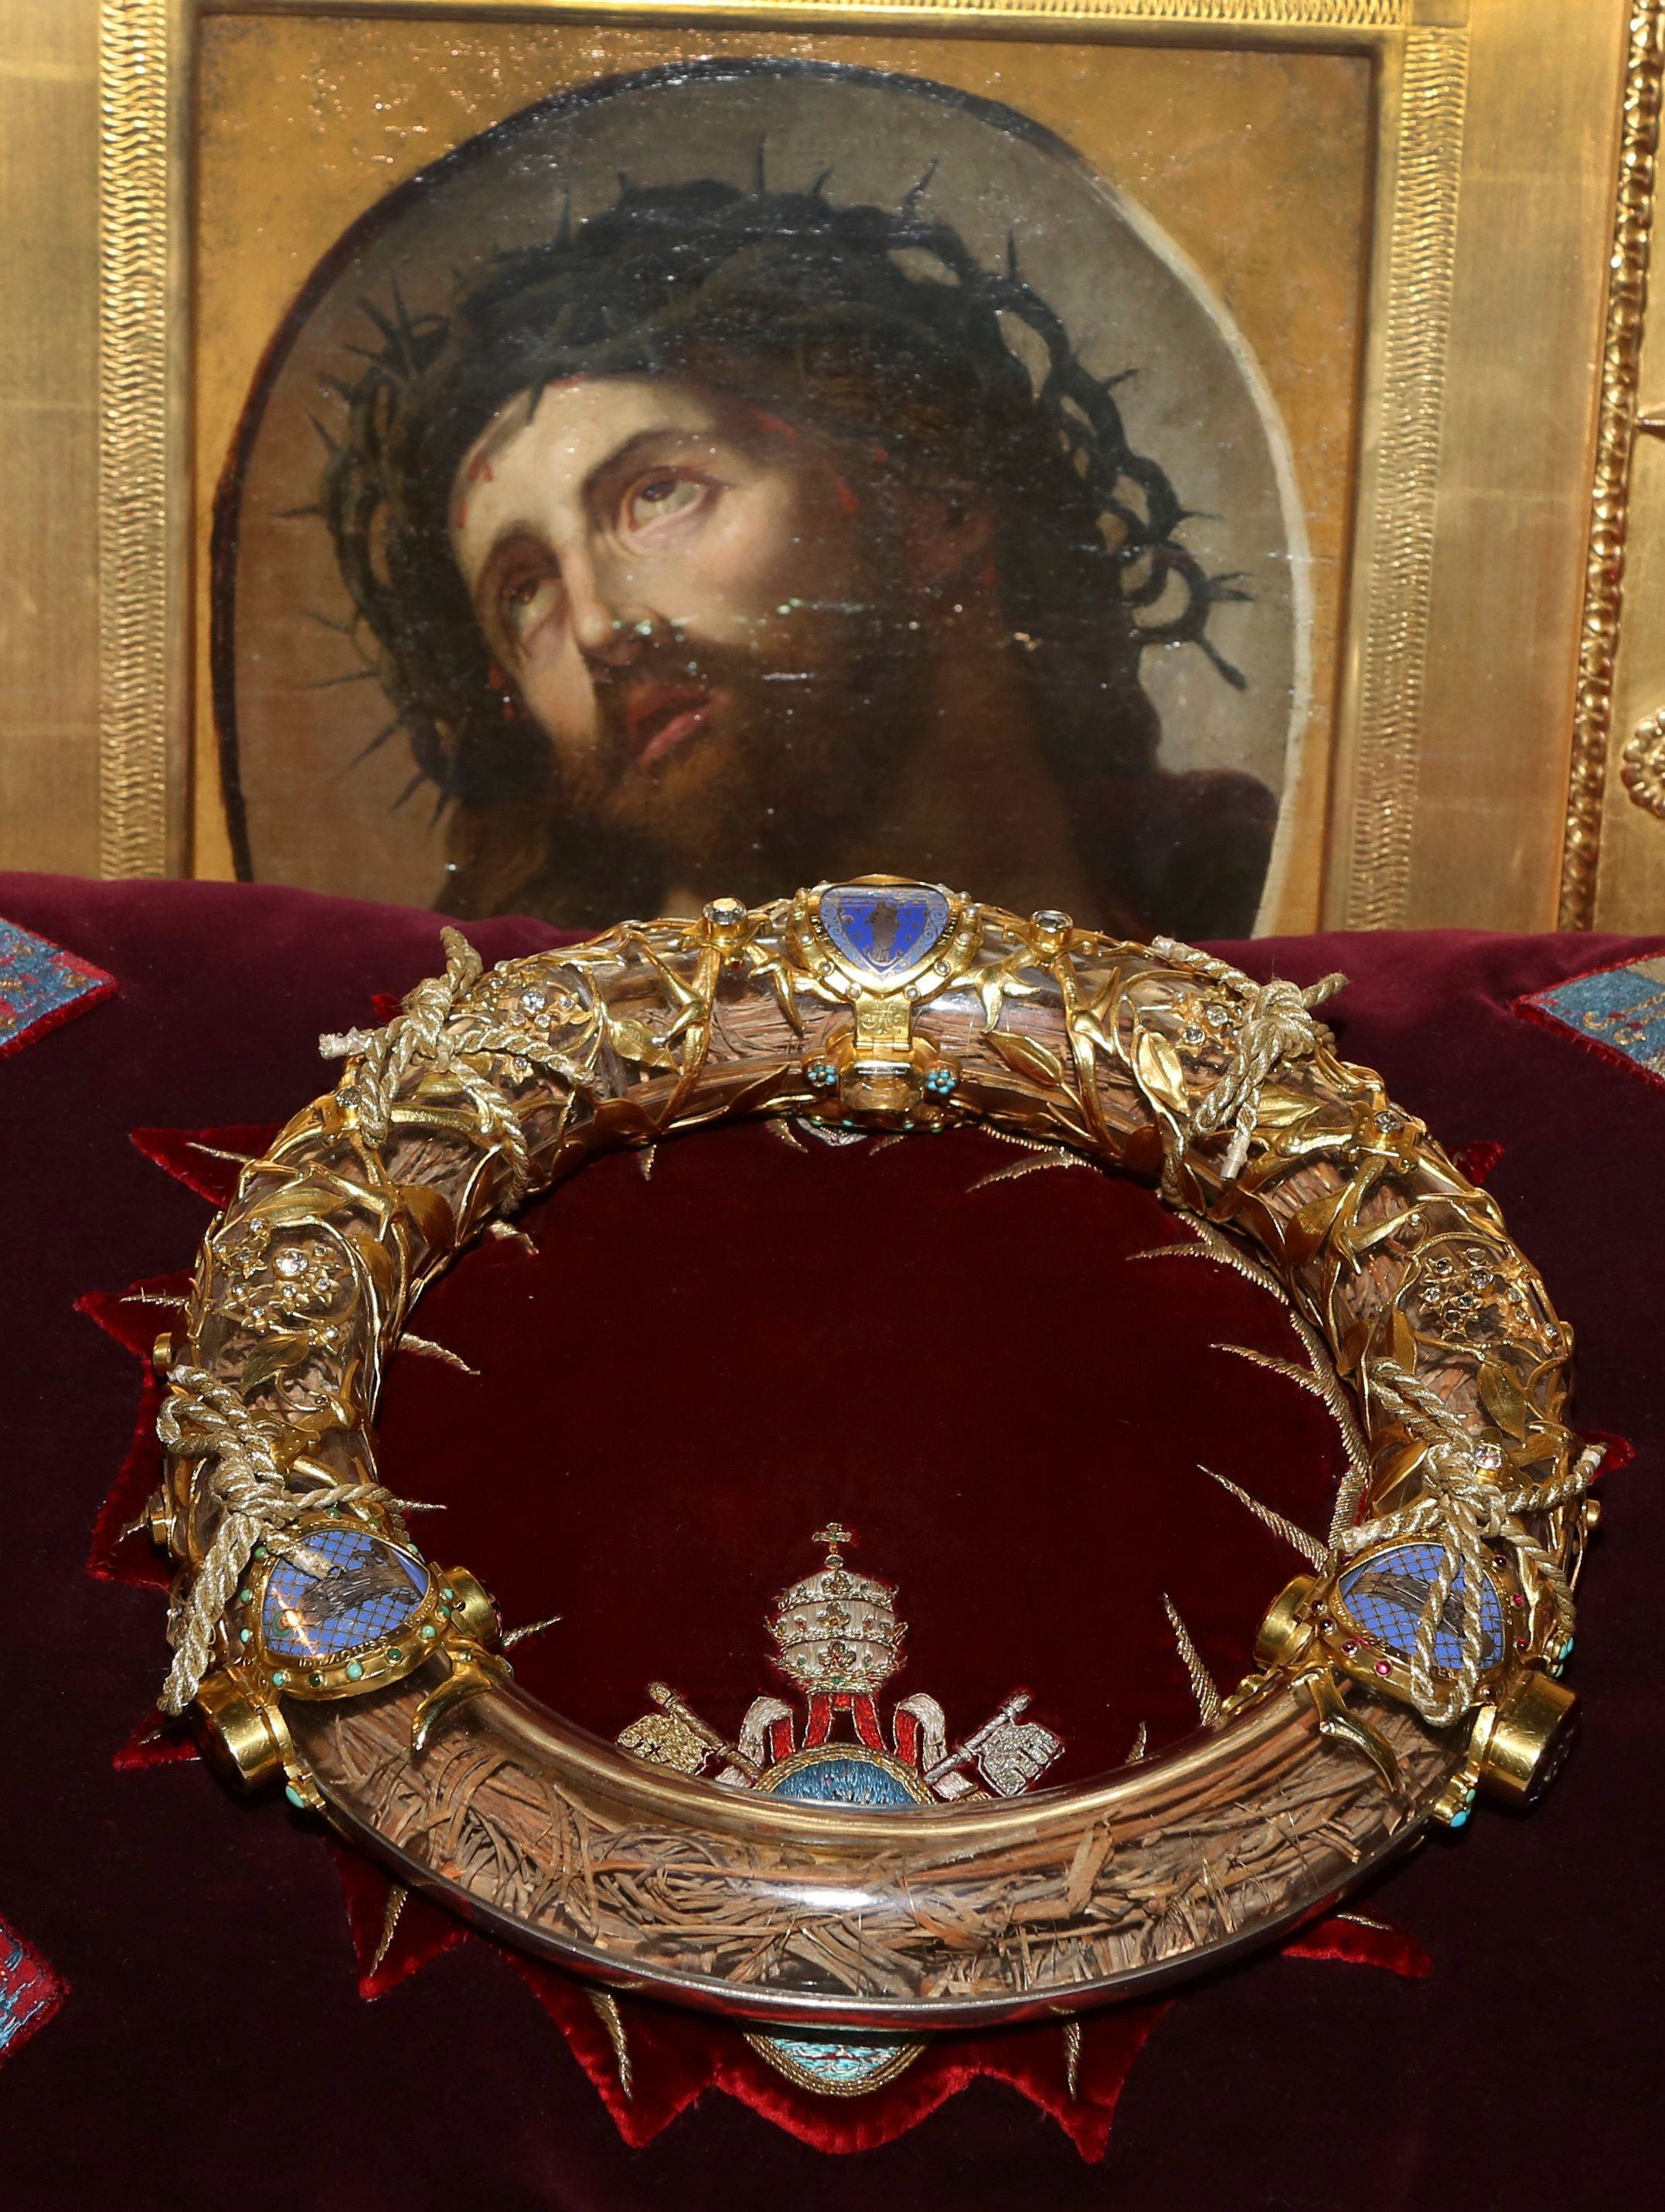 A Paris Terror Attack Hero Helped Save Notre Dame's Treasured Crown Of